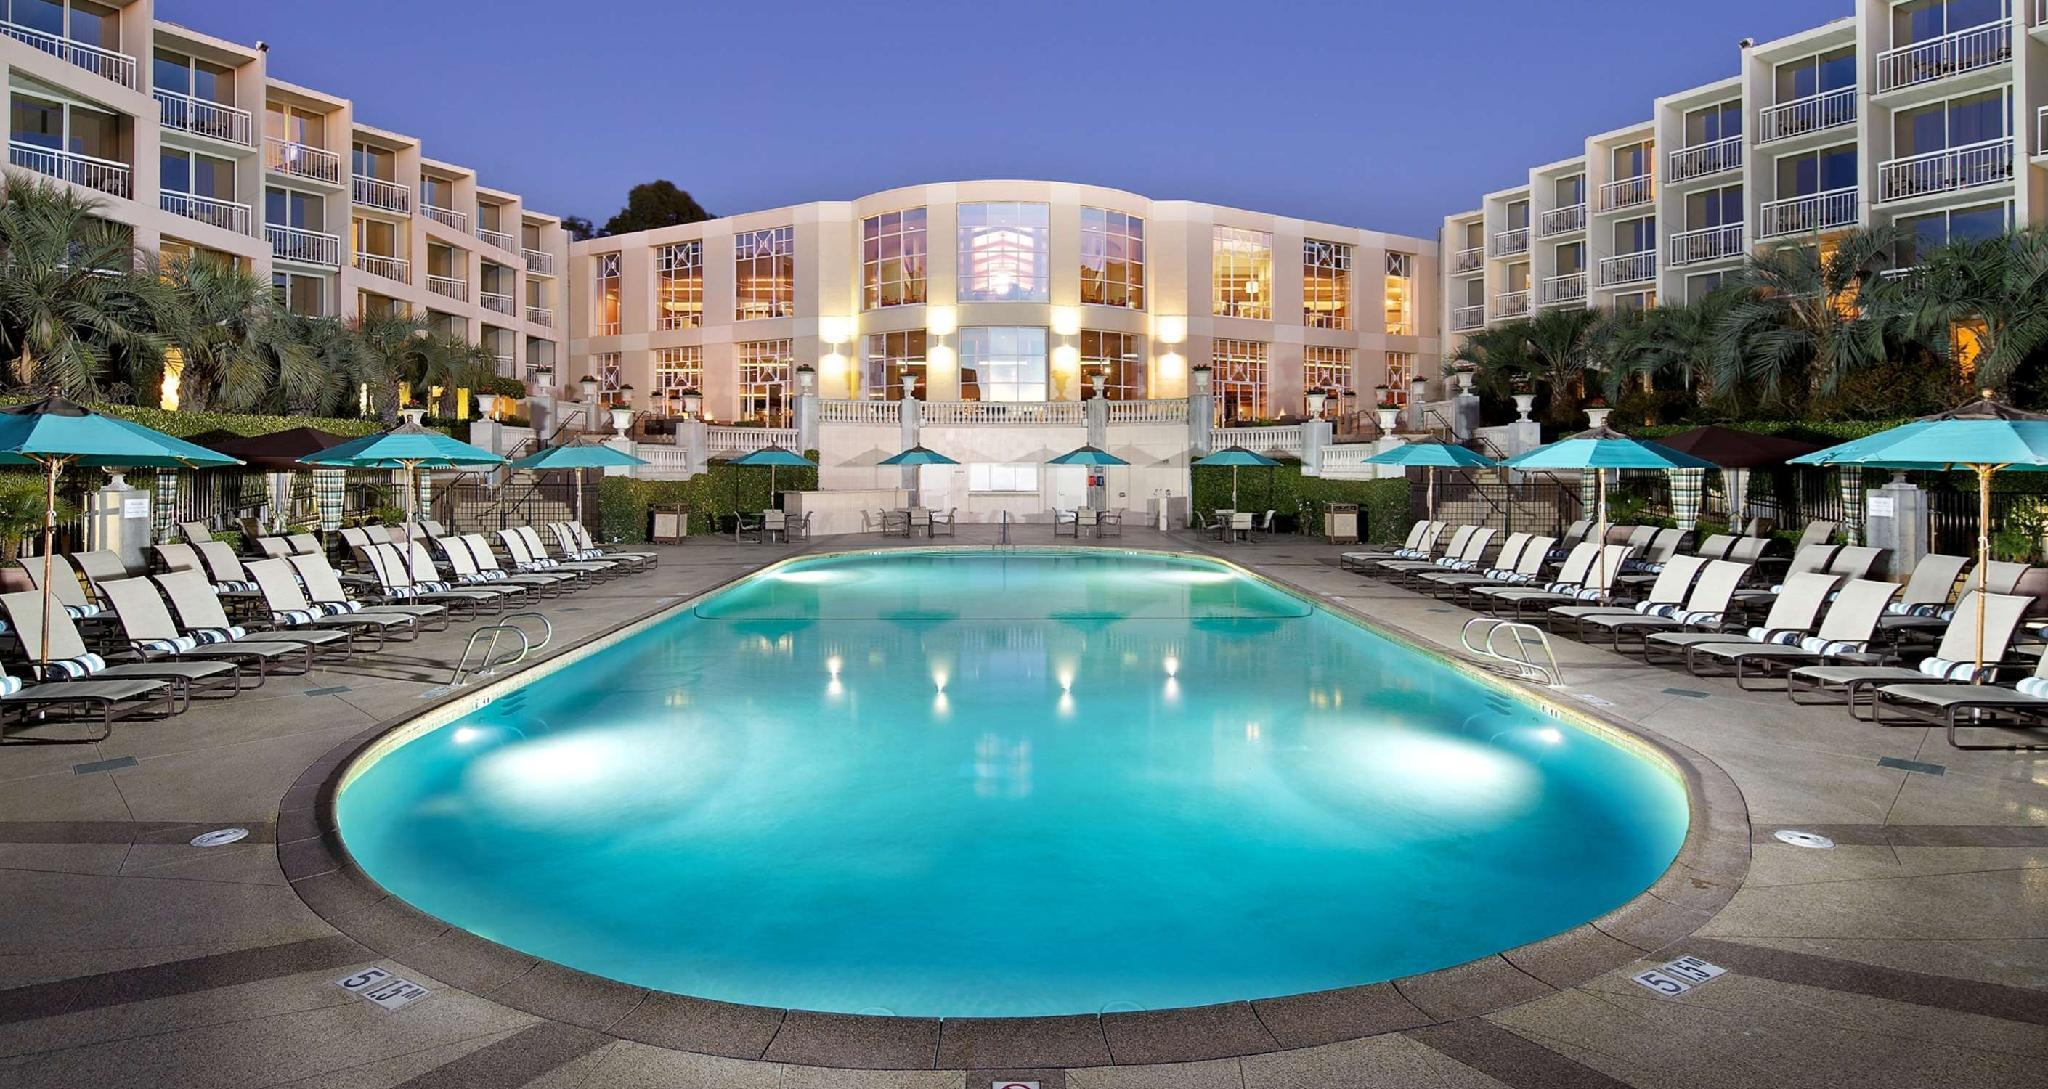 Hilton La Jolla Torrey Pines Hotel image